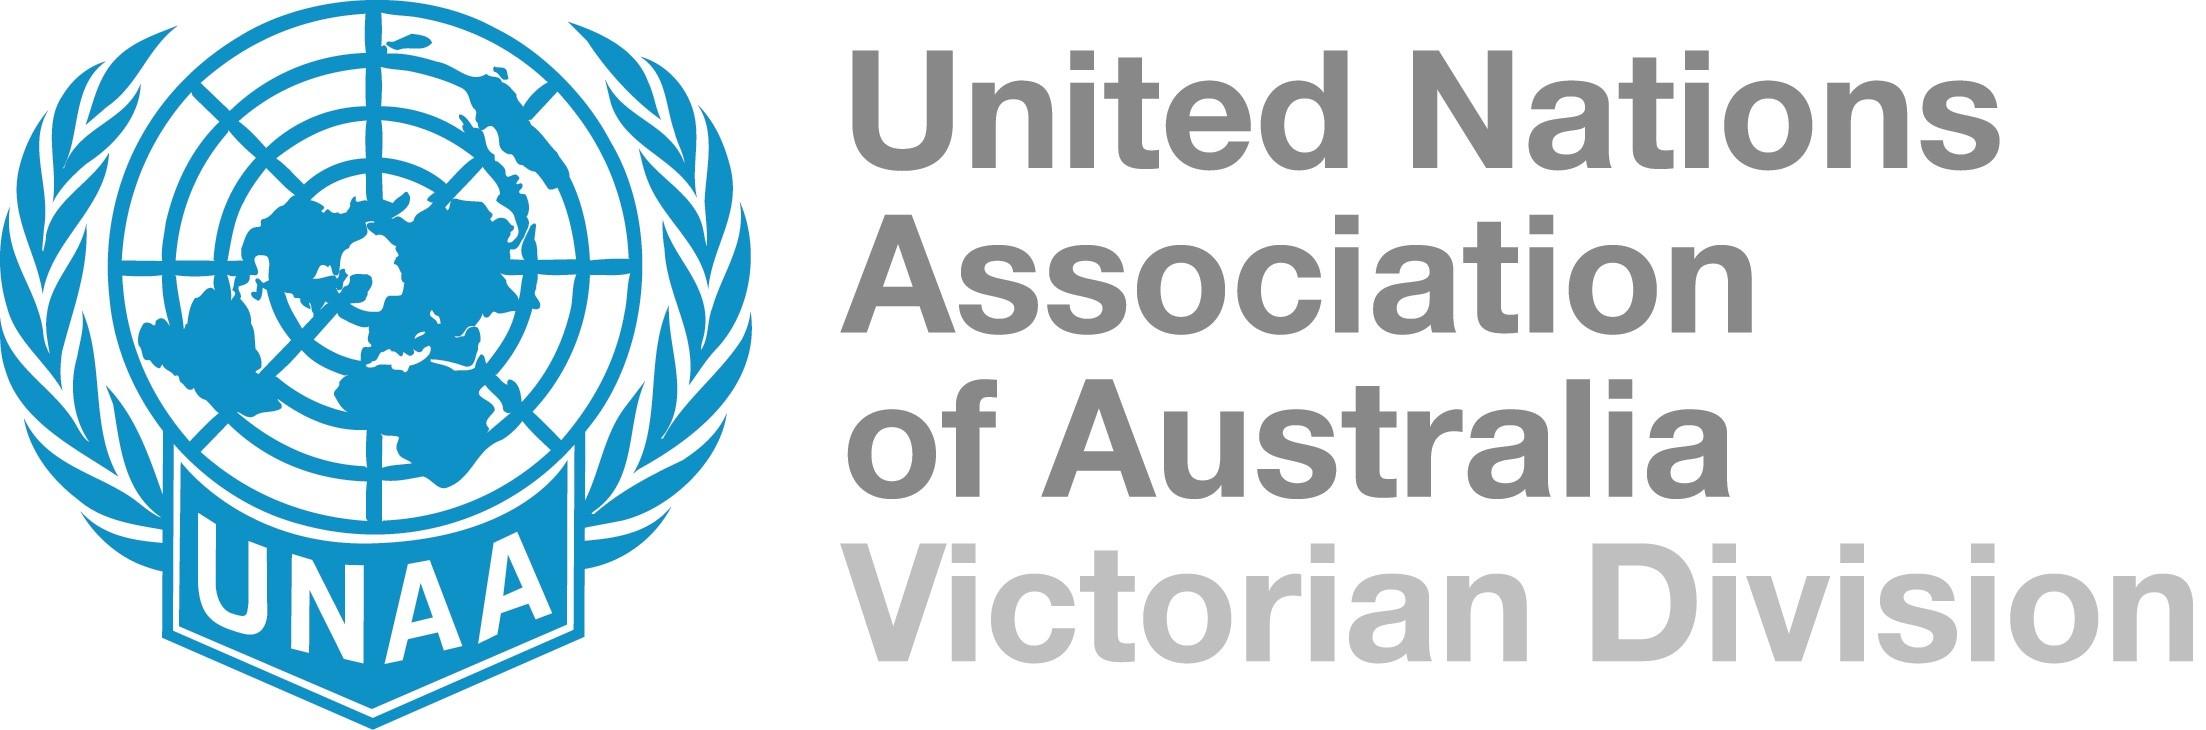 UNAA_VIC_logo